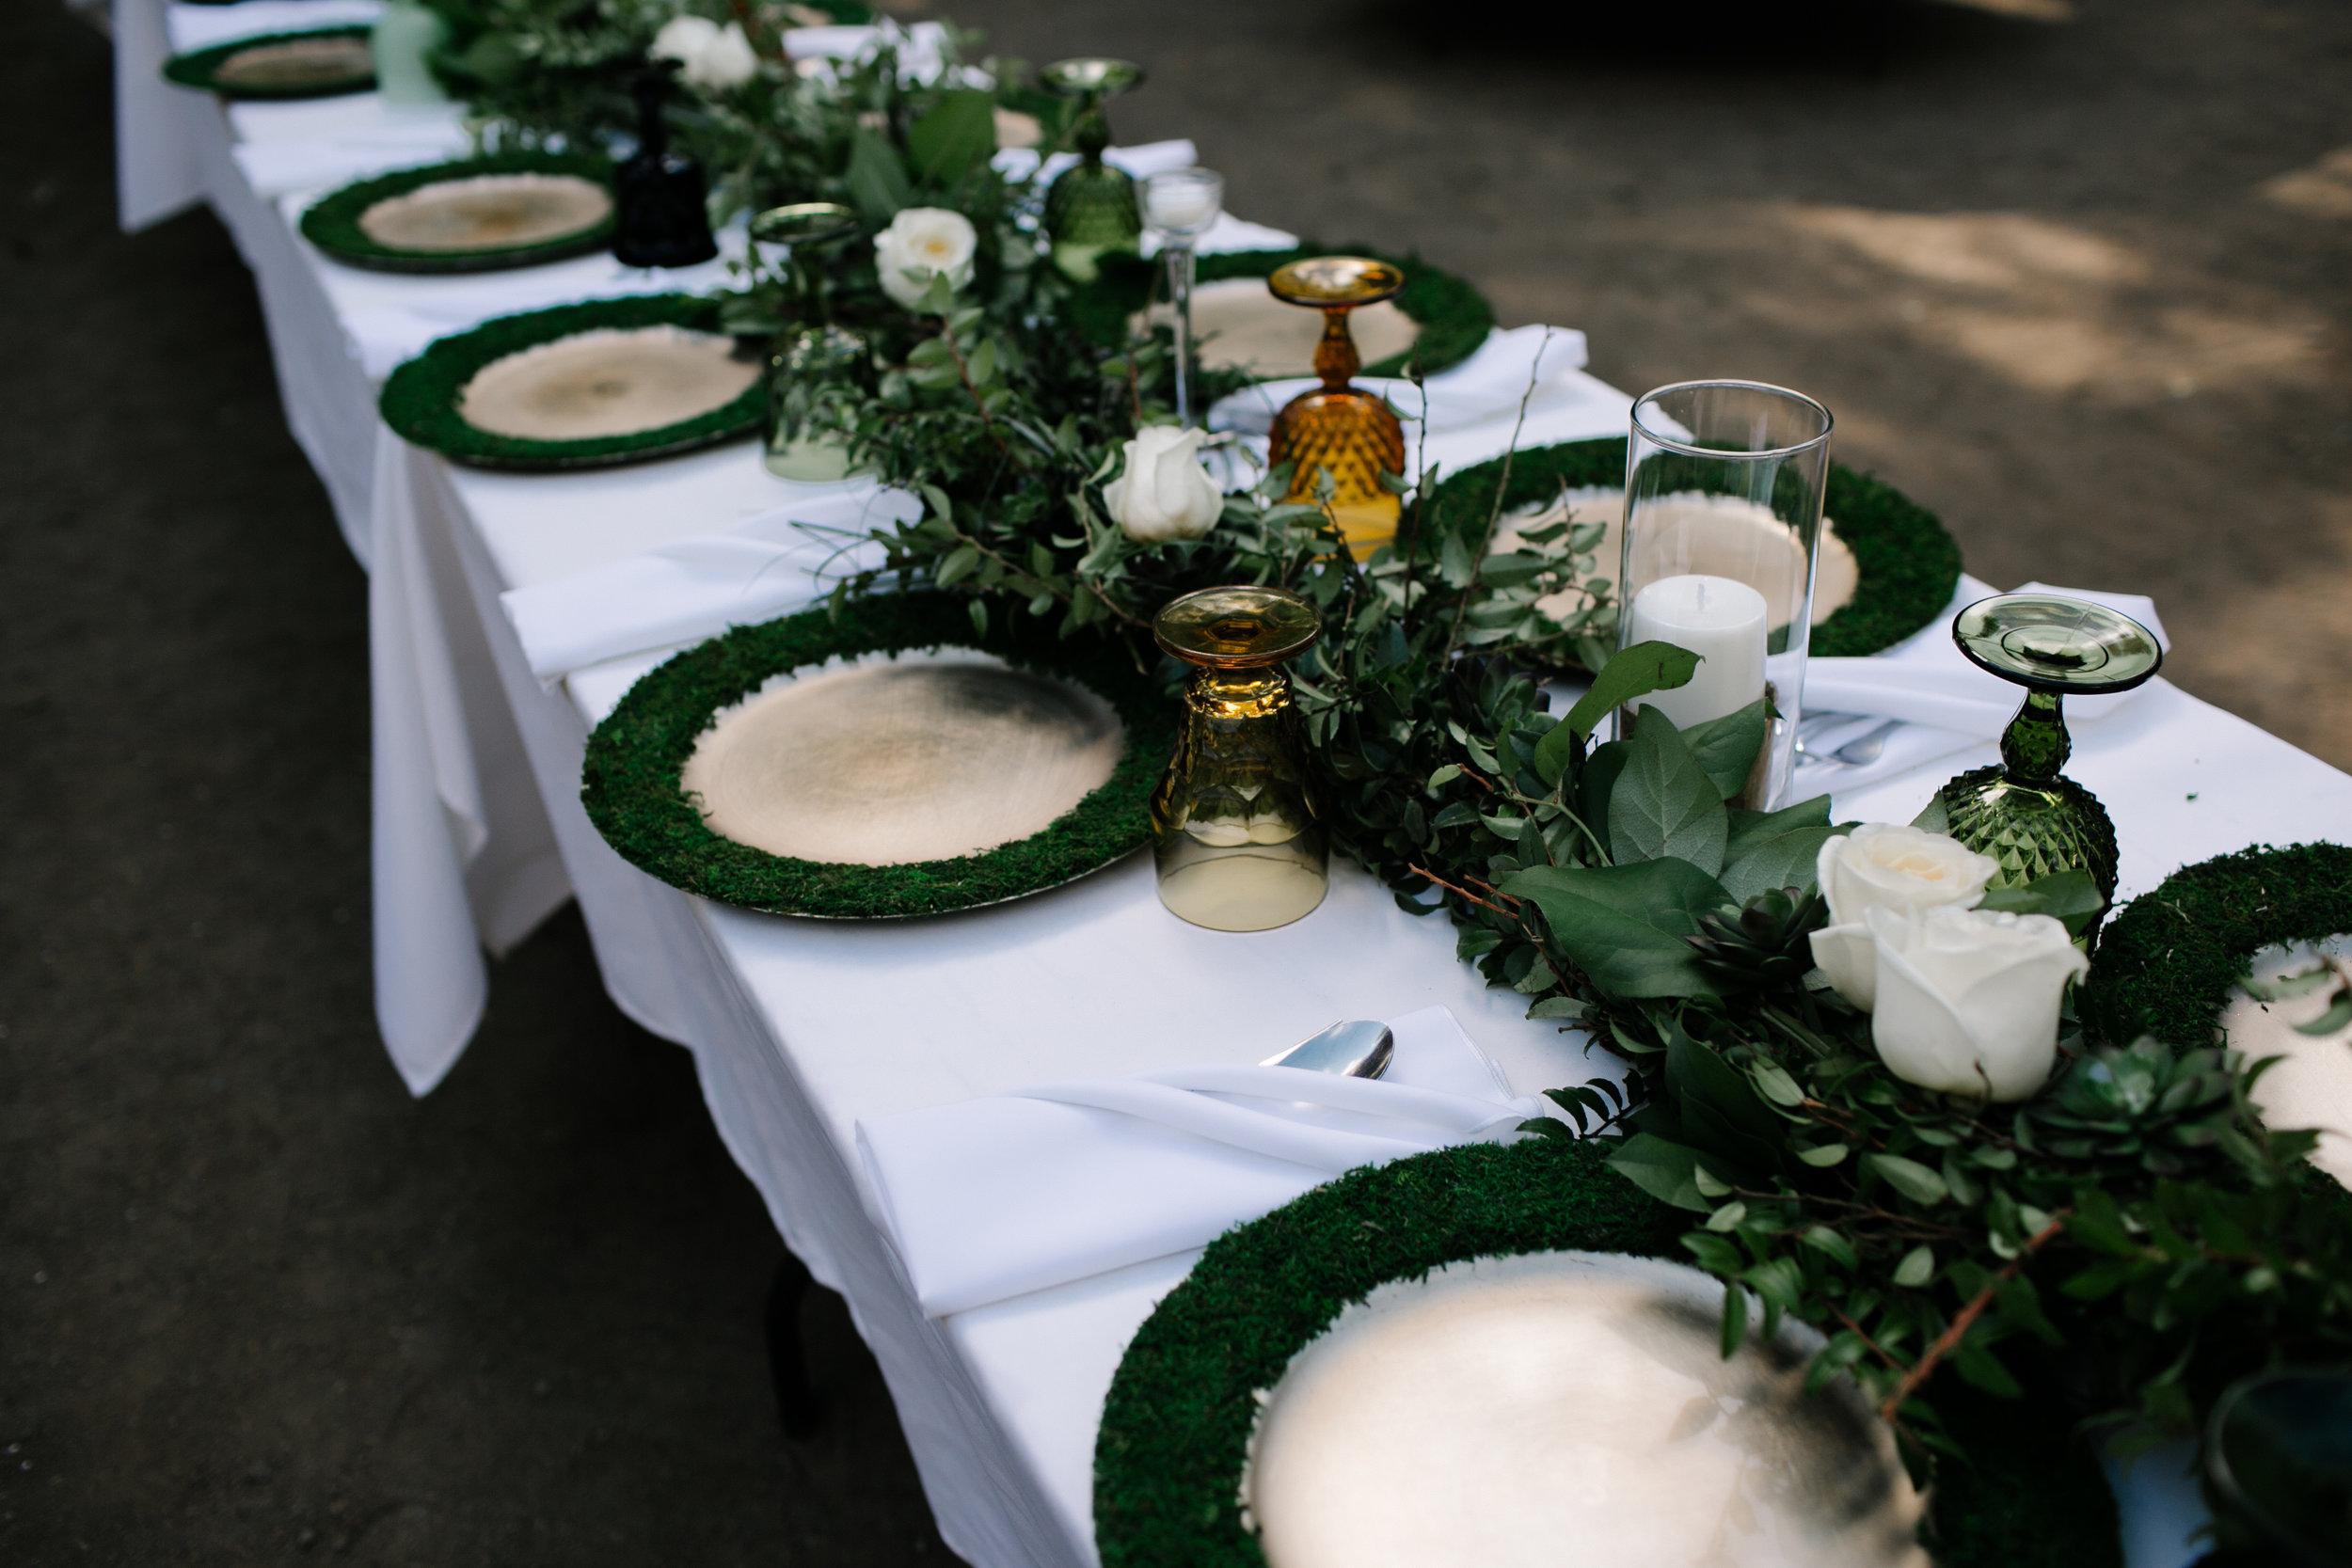 Sevlynn-Photography-Teresa-Chandler-Wedding-7.jpg